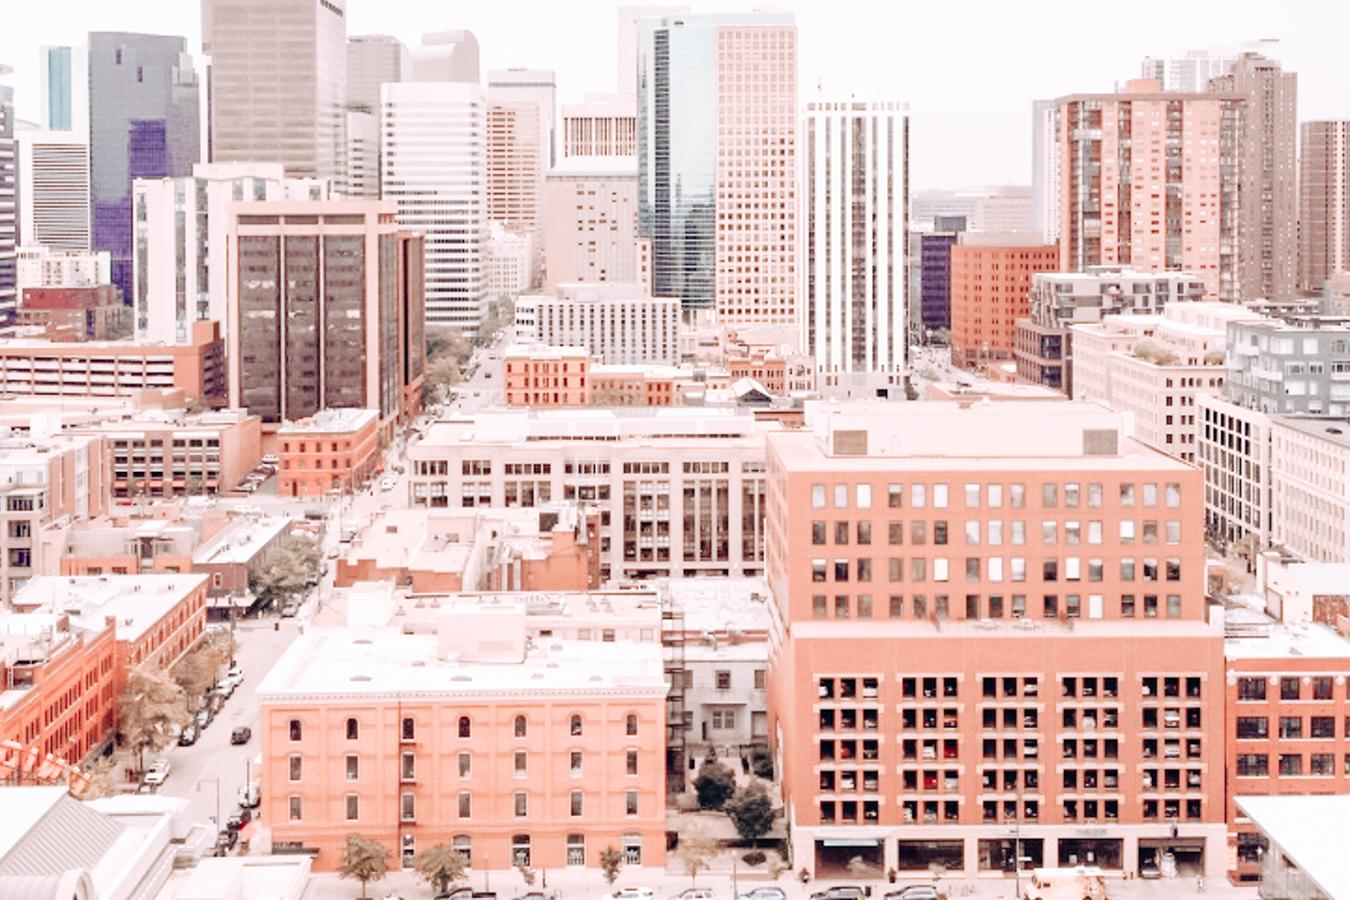 The center of Denver